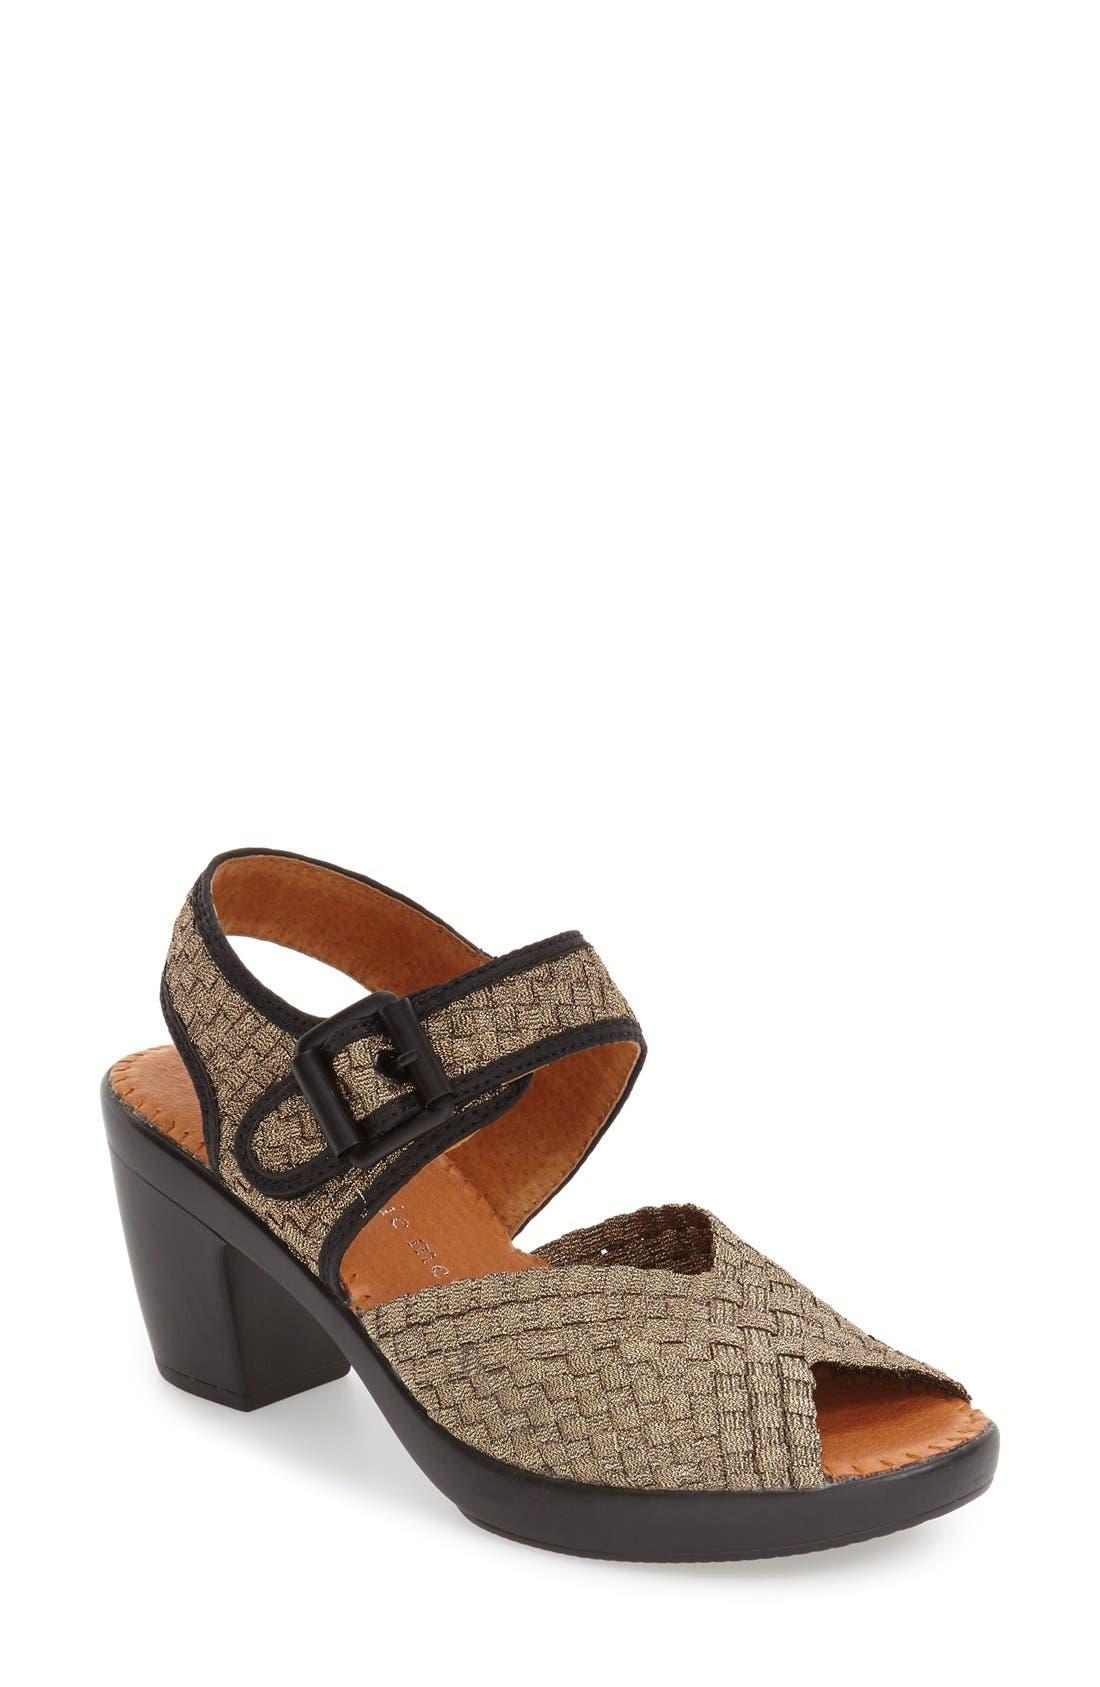 BERNIE MEV. Drisco Platform Sandal